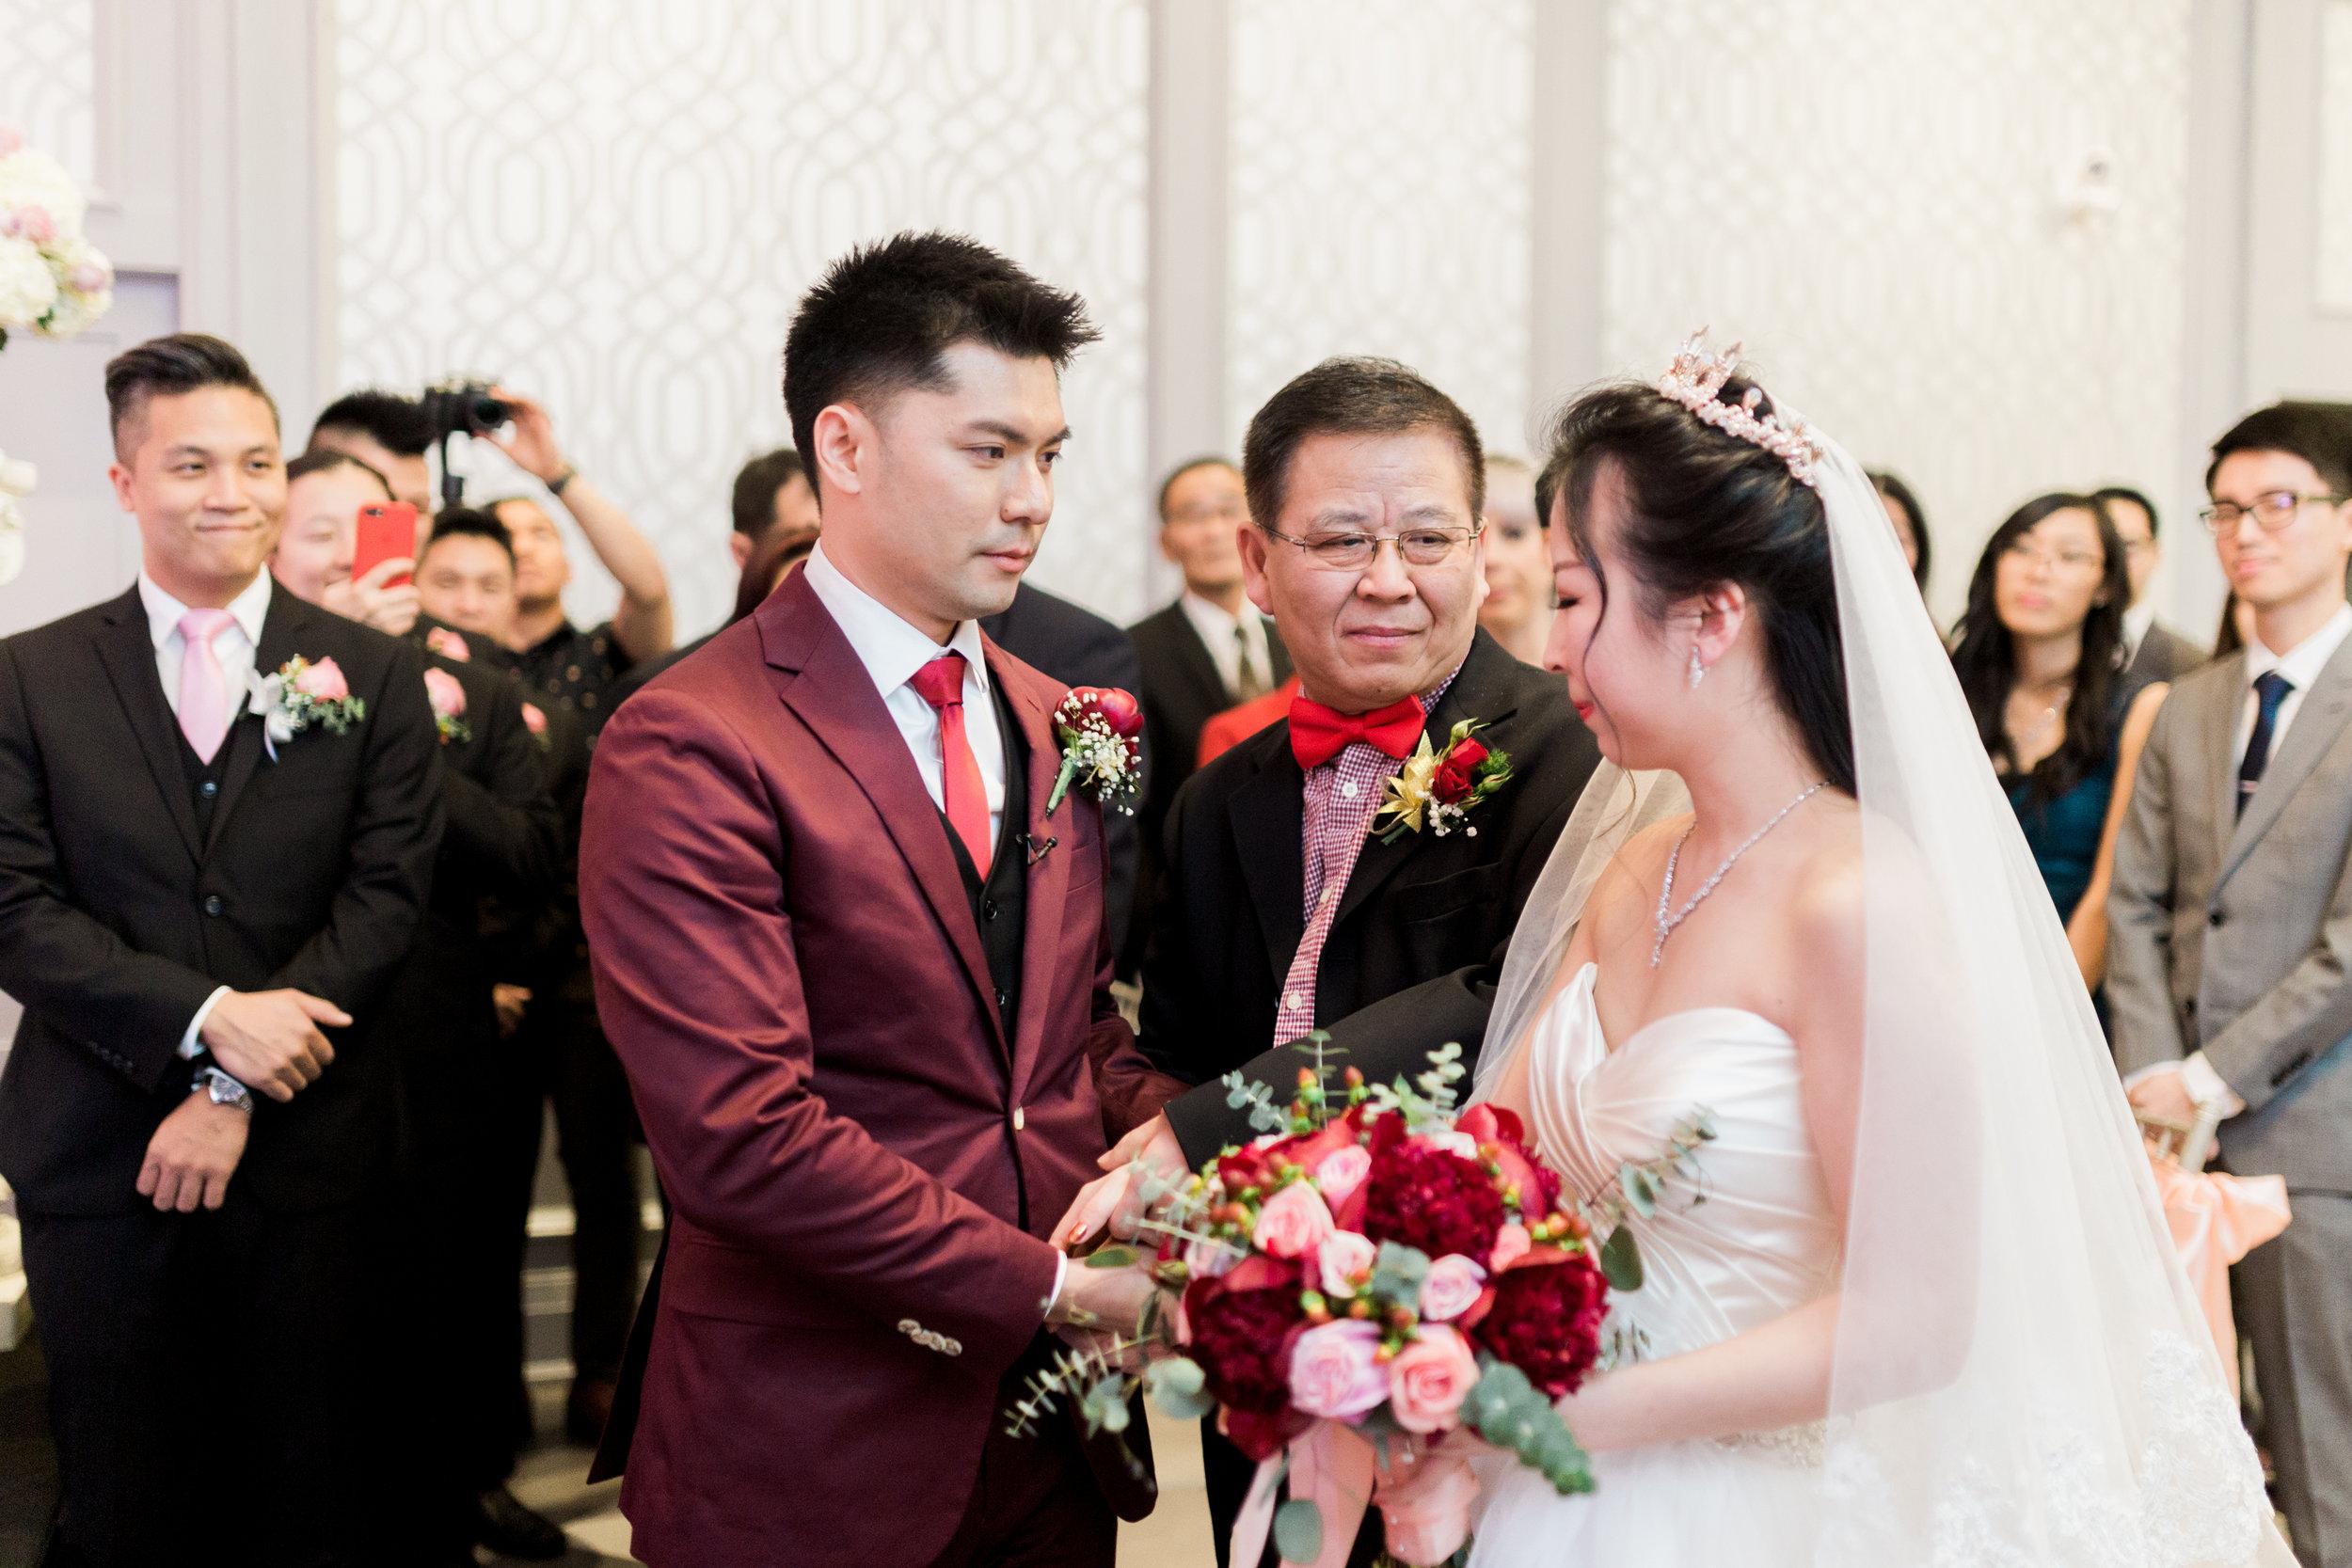 Parkview Manor Wedding - Ceremony-59.jpg